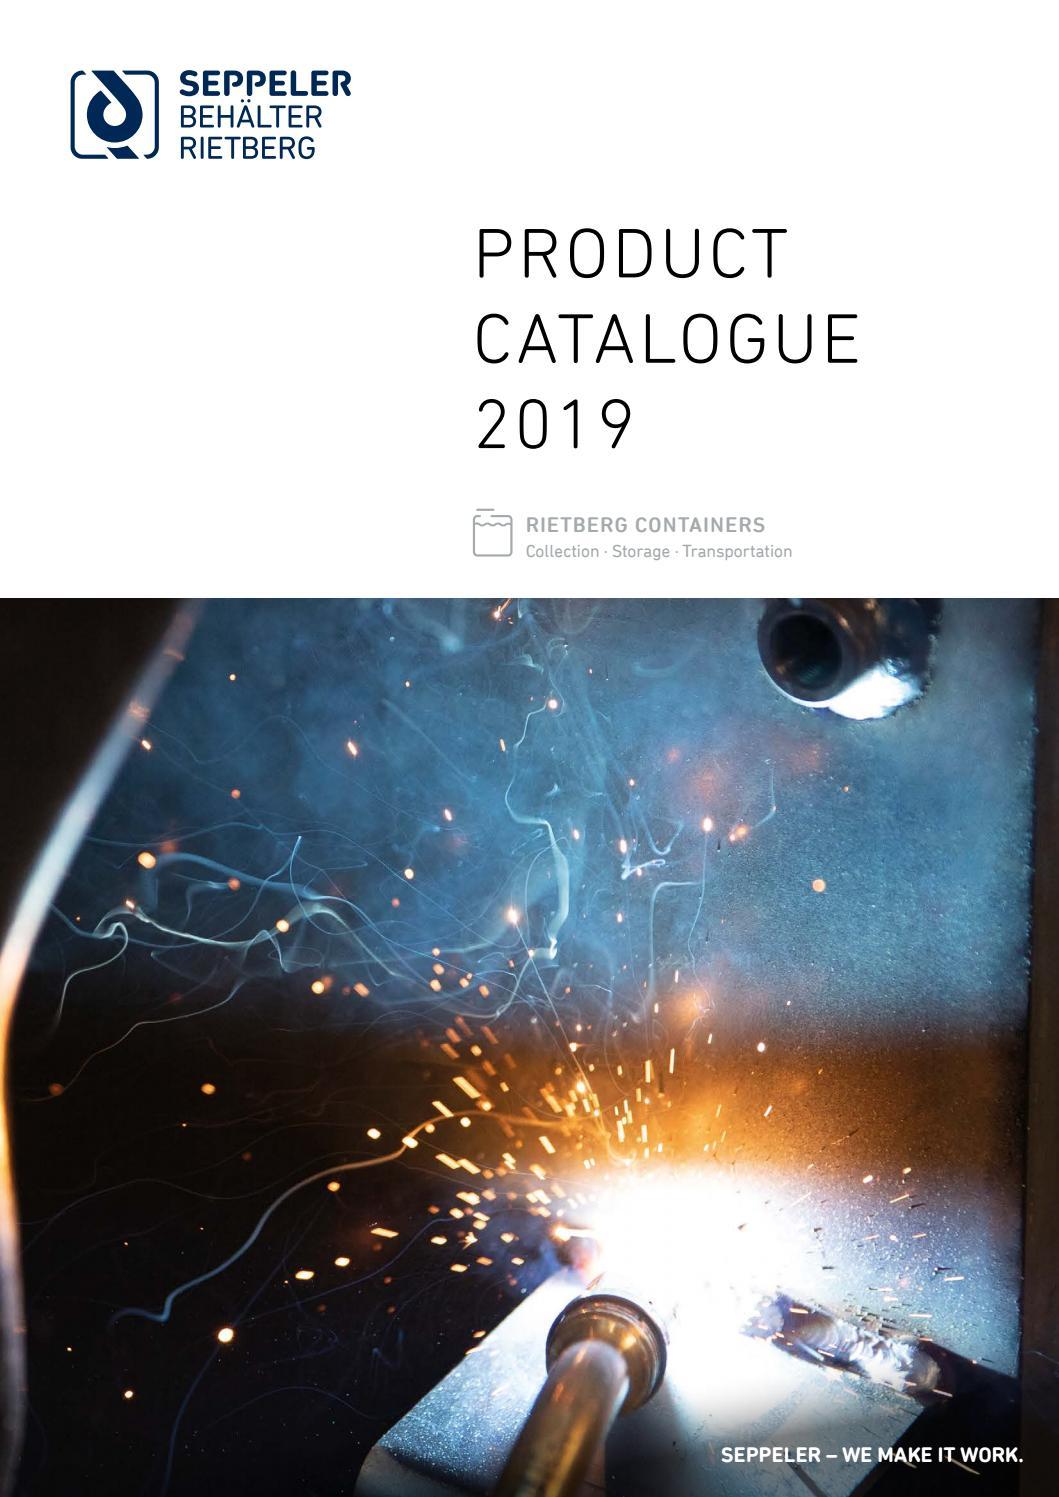 Product Catalogue 2019 by seitenweise online/offline - issuu